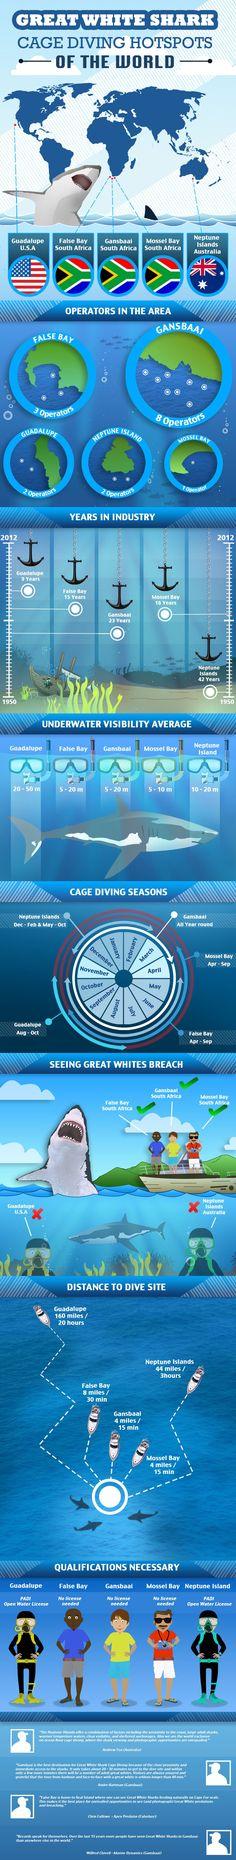 Great White #Shark Cage Diving Hotspots of the World. #scubapro #scubadiverslife #scuba #scubadive #dive #buceo #buceando #PADI #ACUC #SSI #NAUI #scubadiver #scubadiving #diver #underwater #uwphotography #instadive #ilovediving #diveforlife #mares #divemaster